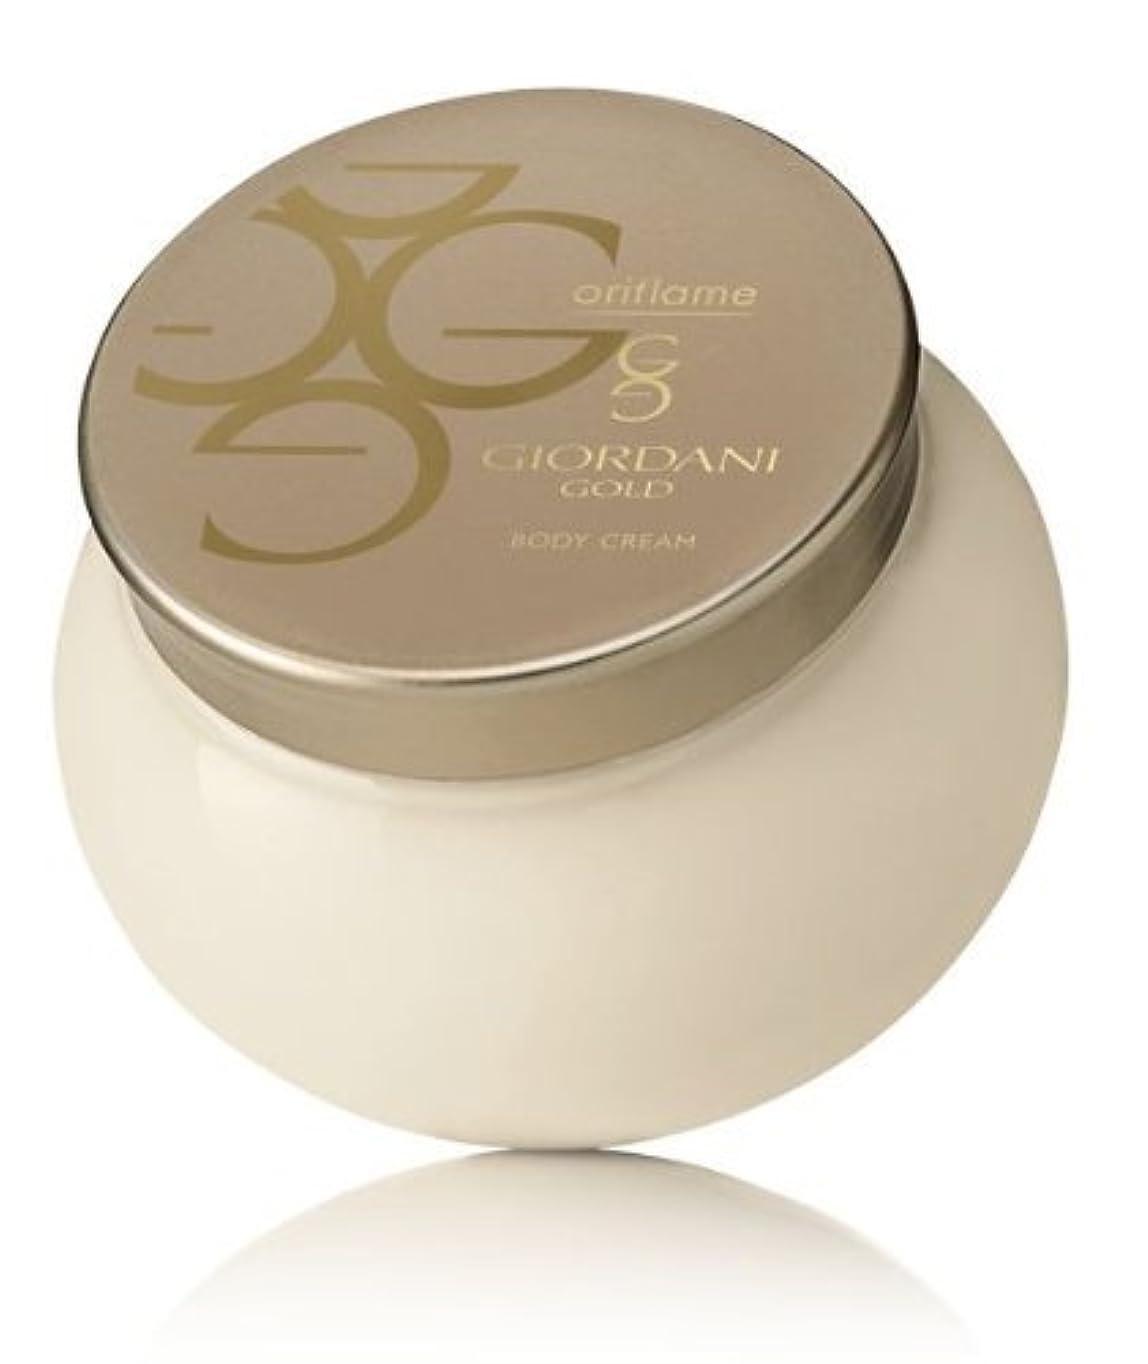 砂規制状況Giordani Gold Body Cream by Oriflame